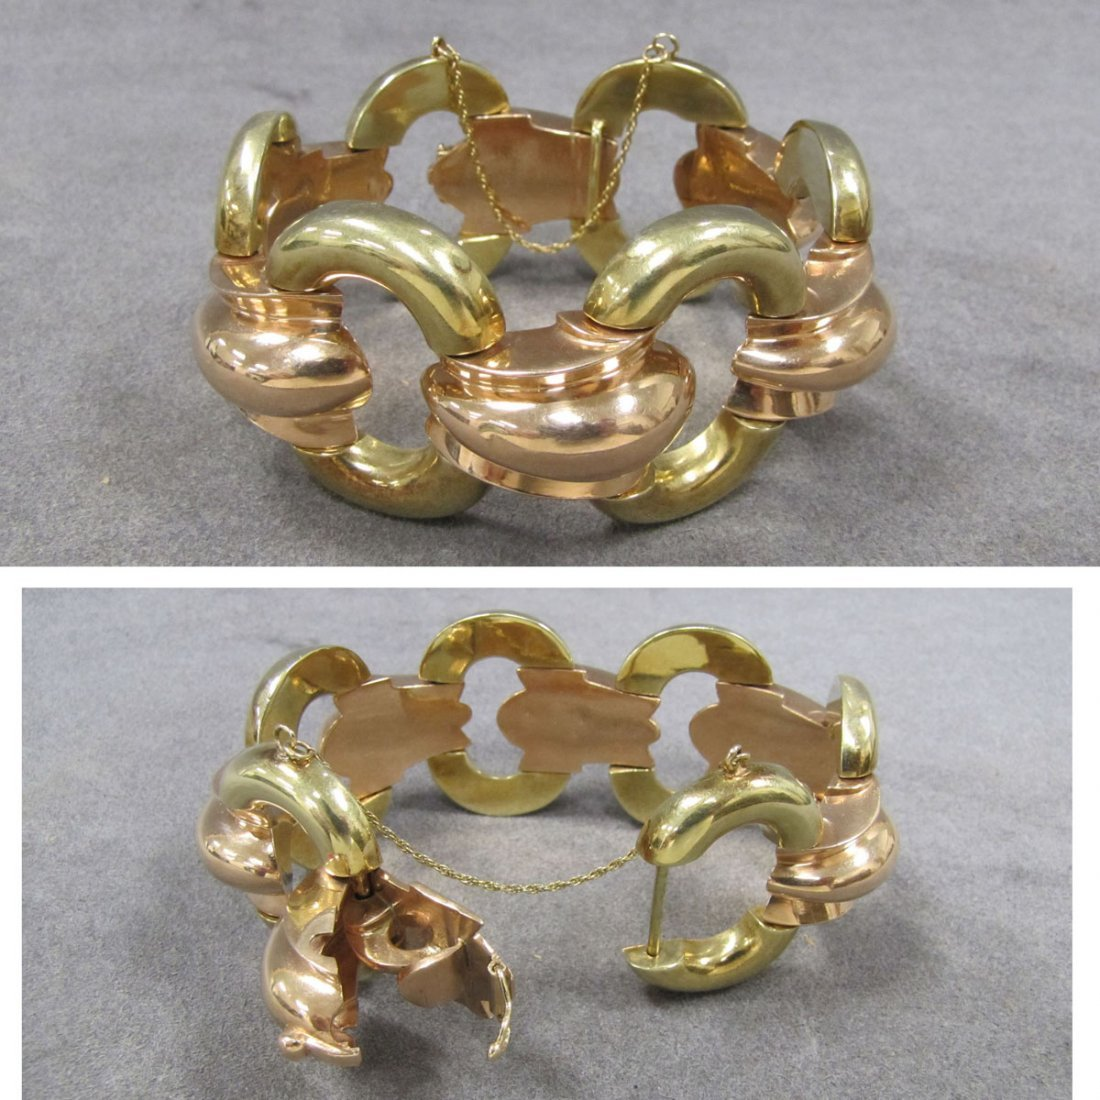 TIFFANY & CO 14K YELLOW & PINK GOLD RETRO BRACELET